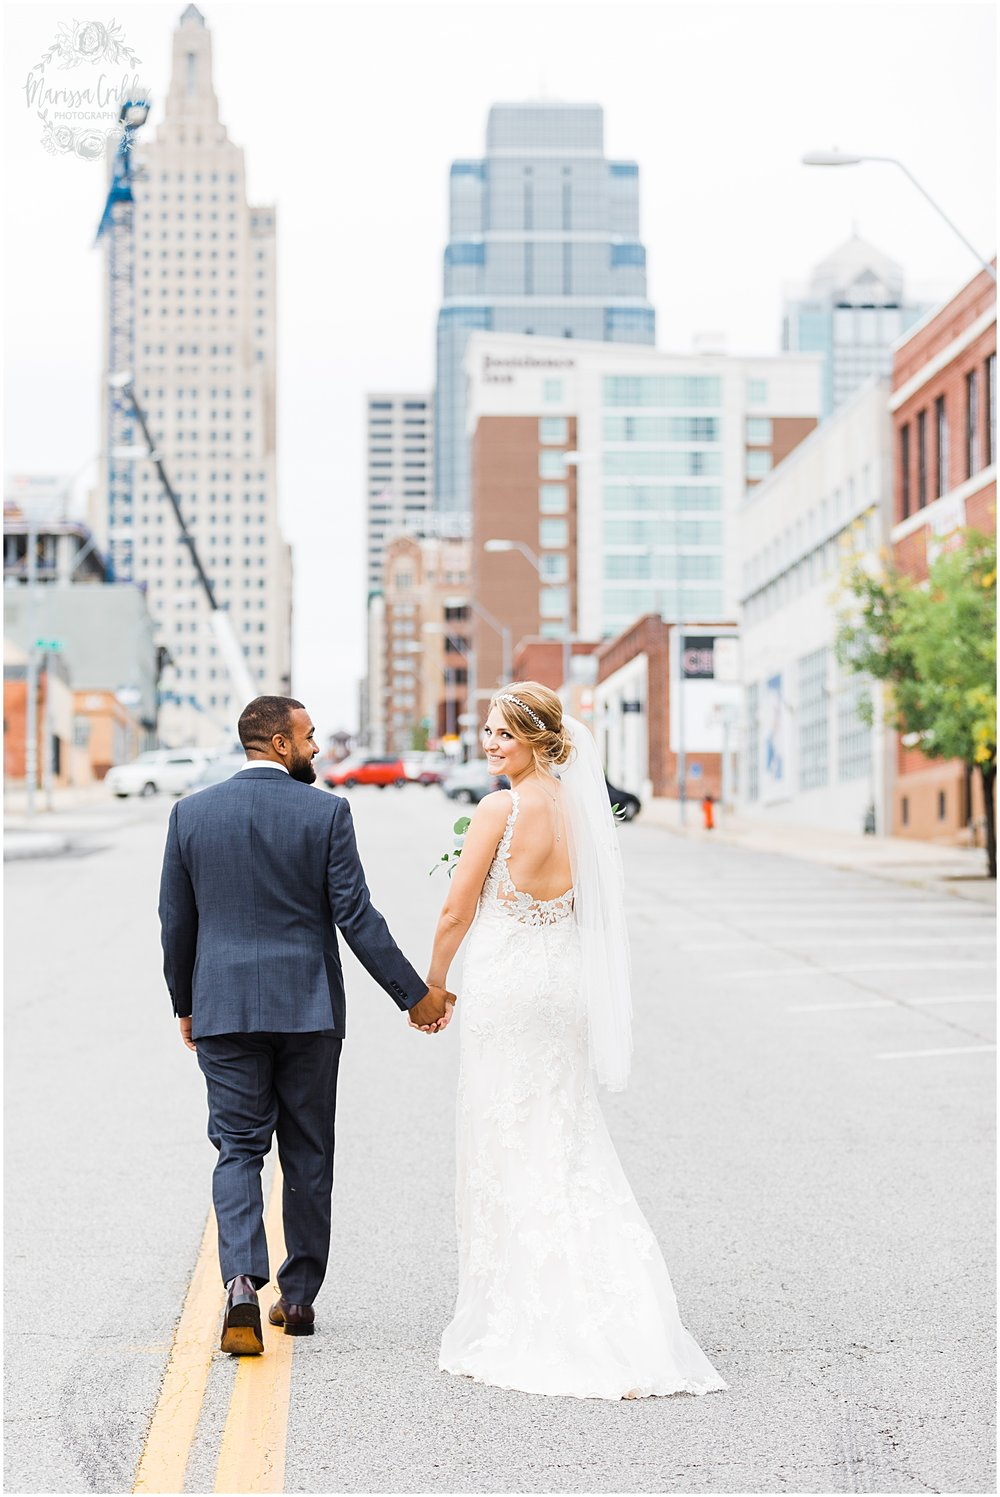 BAUER WEDDING   KELSEA & JUSTIN   MARISSA CRIBBS PHOTOGRAPHY_6542.jpg